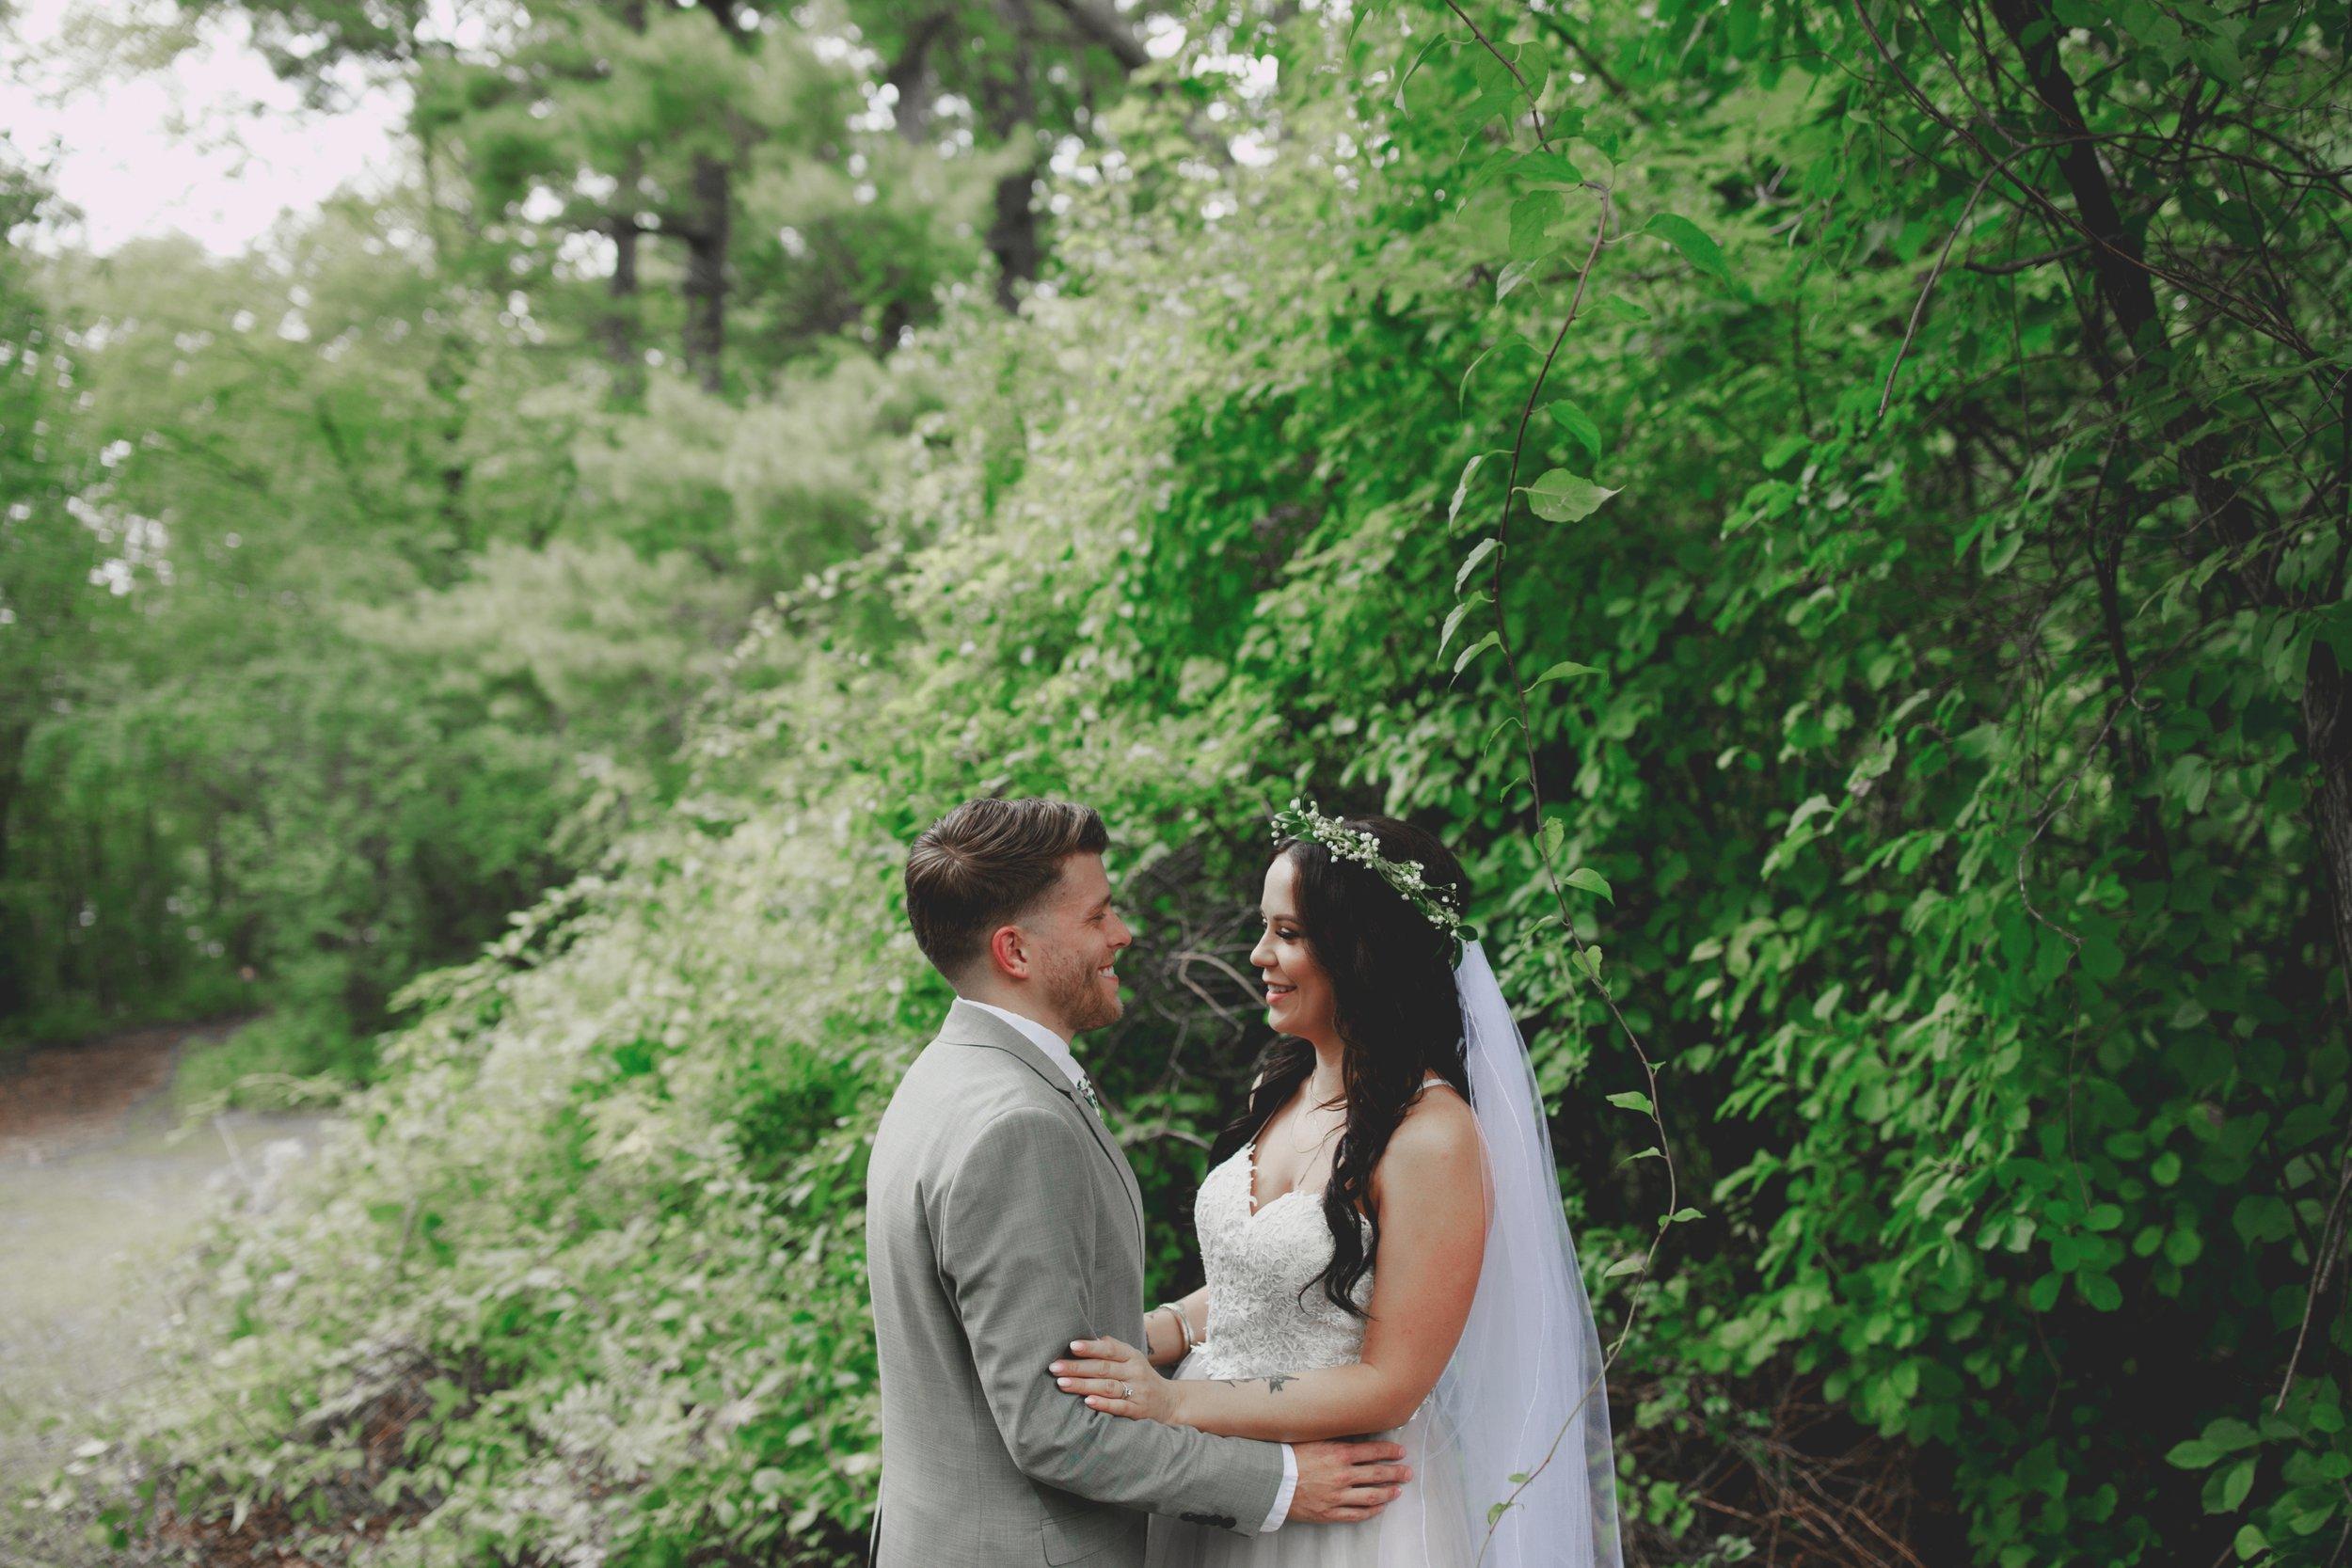 amanda_vanvels_michigan_camp_wedding_033.jpg